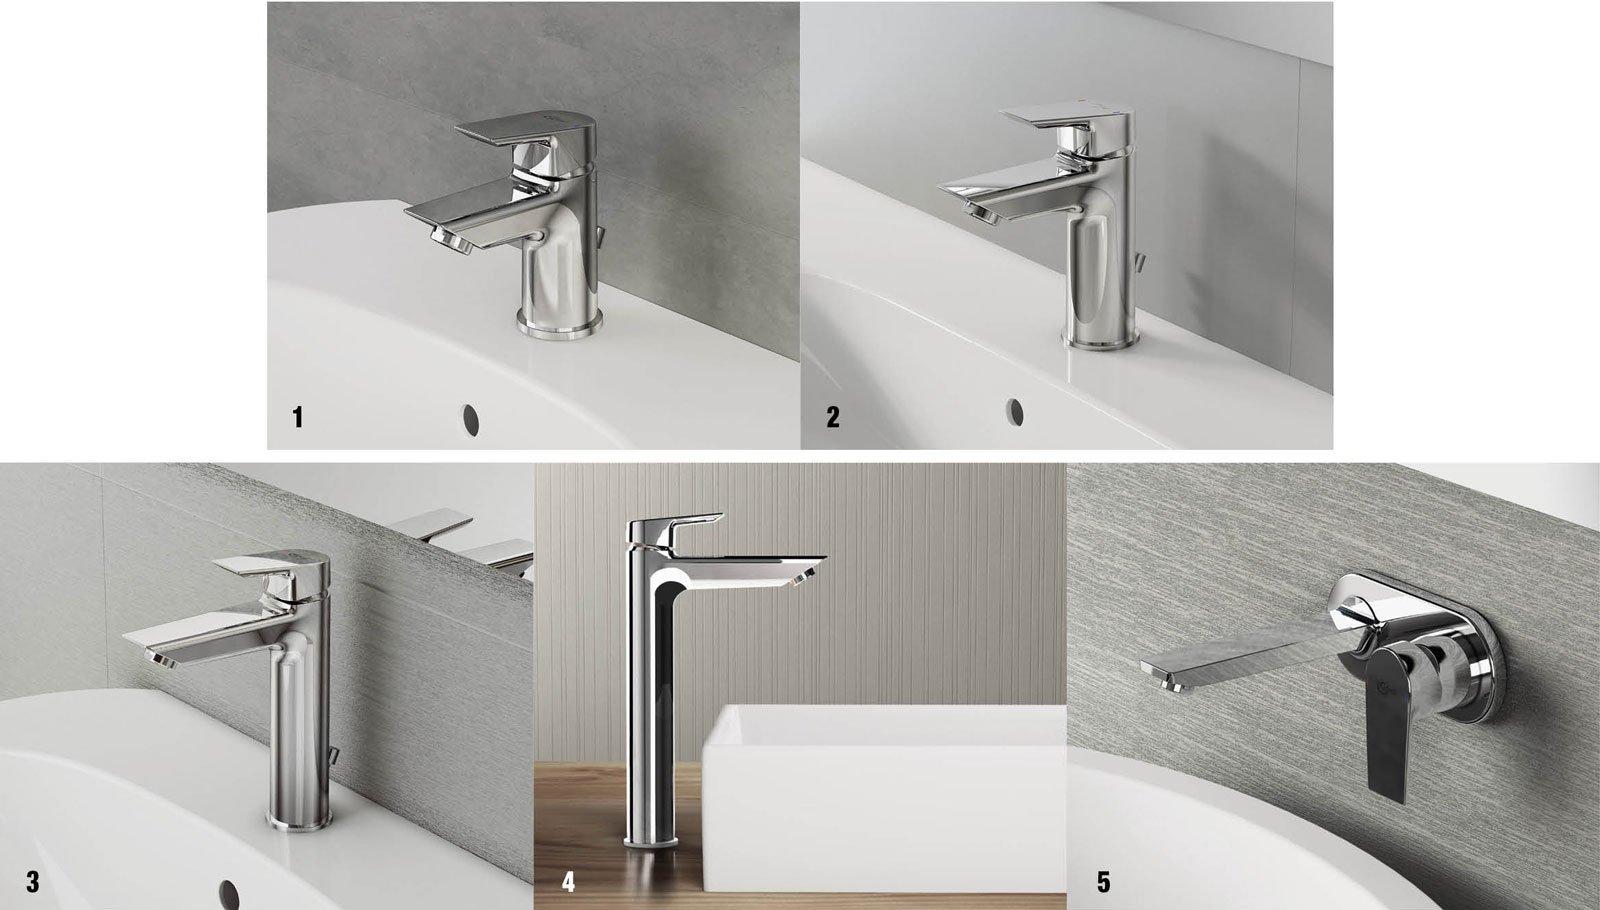 Tesi e ceramix per un bagno di tendenza cose di casa - Aeratore per bagno ...